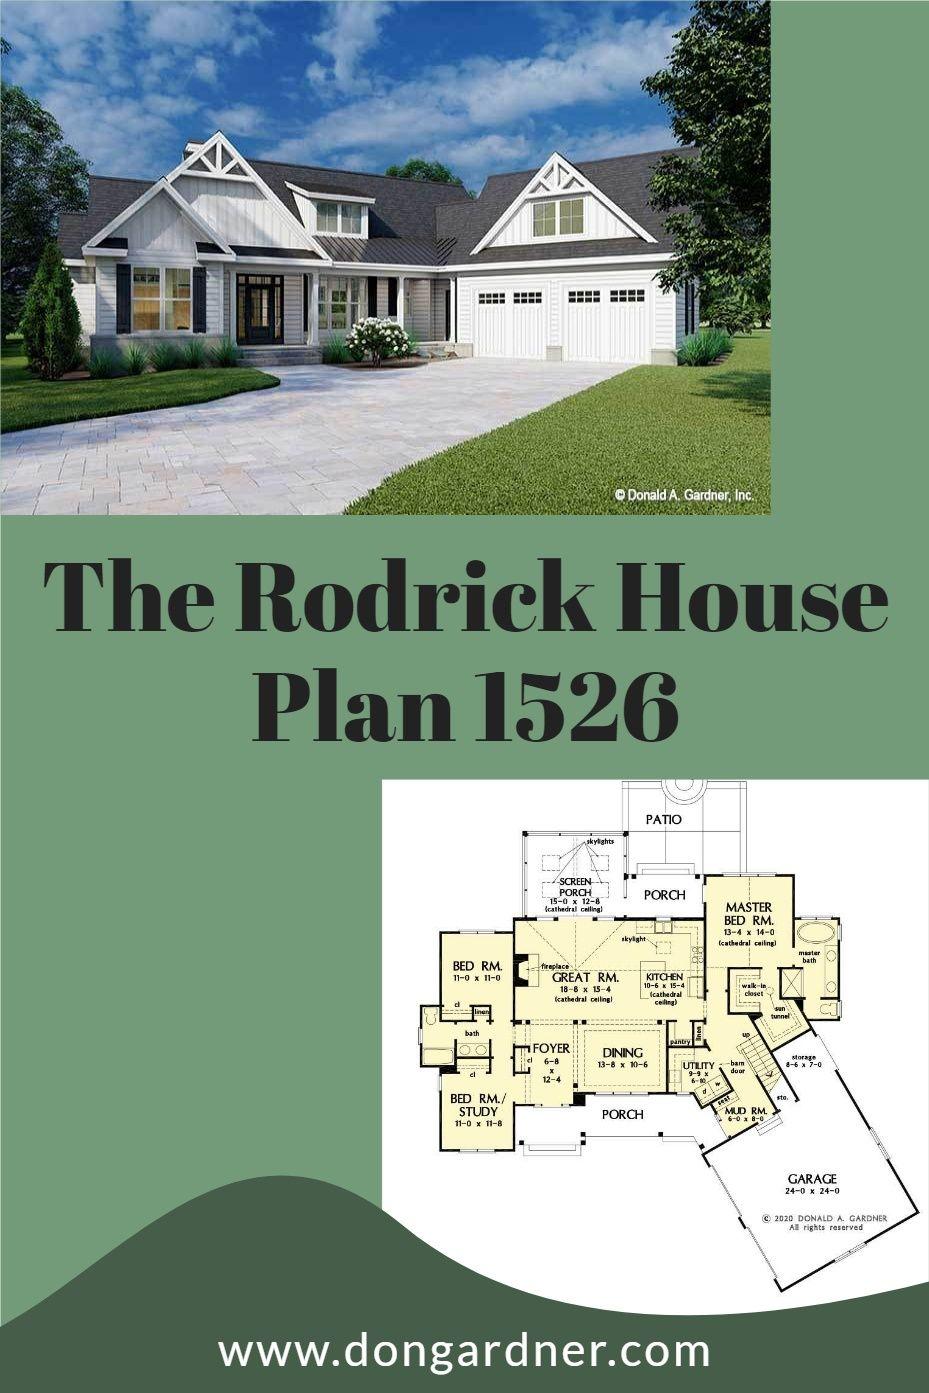 The Rodrick House Plan 1526